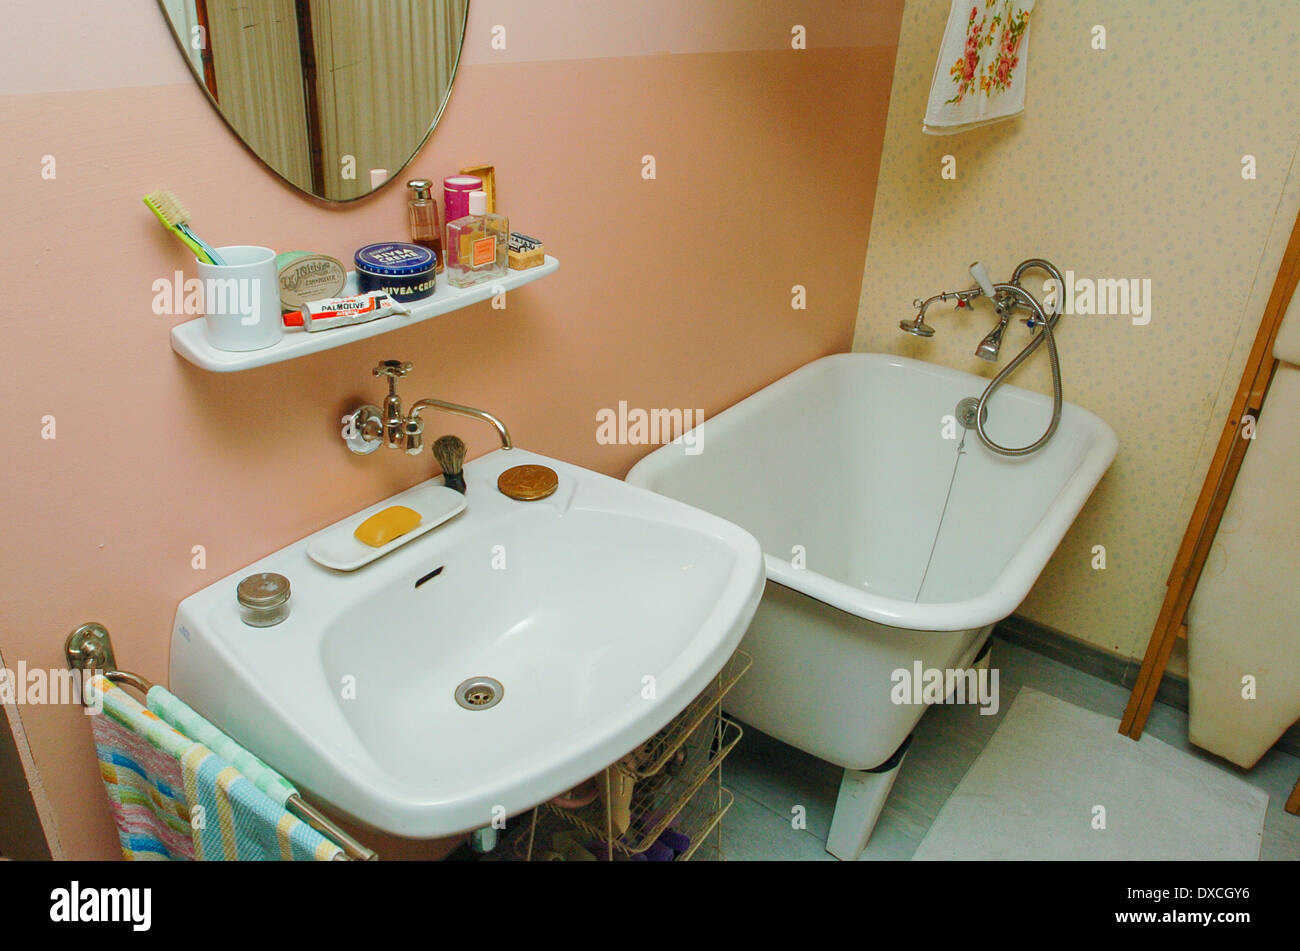 Apartment in 50s style stockfotos apartment in 50s style bilder alamy - Badezimmer 50er ...